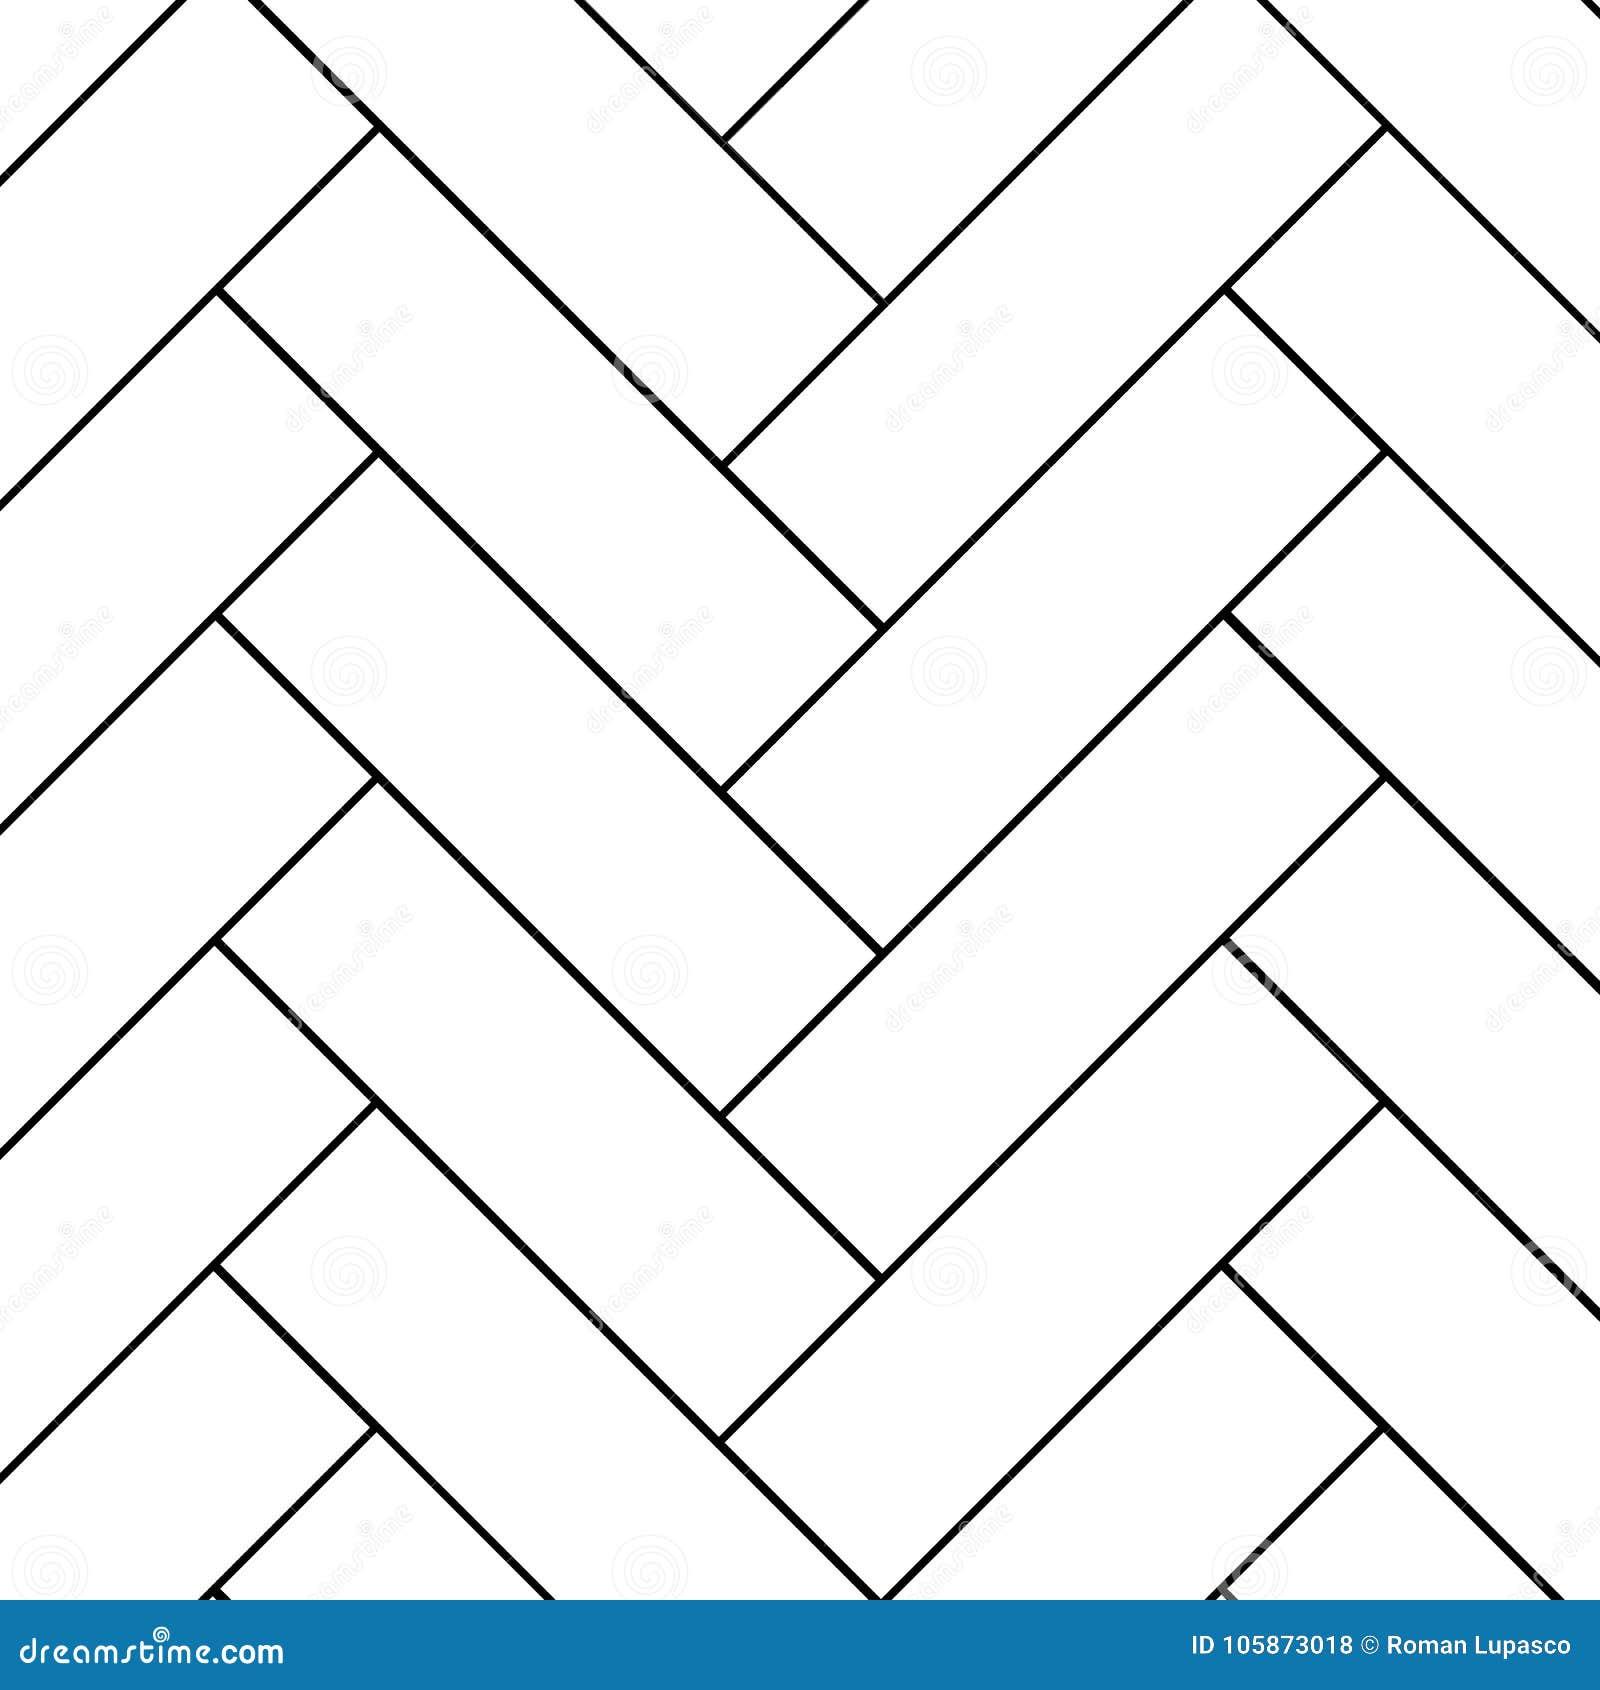 pattern outline